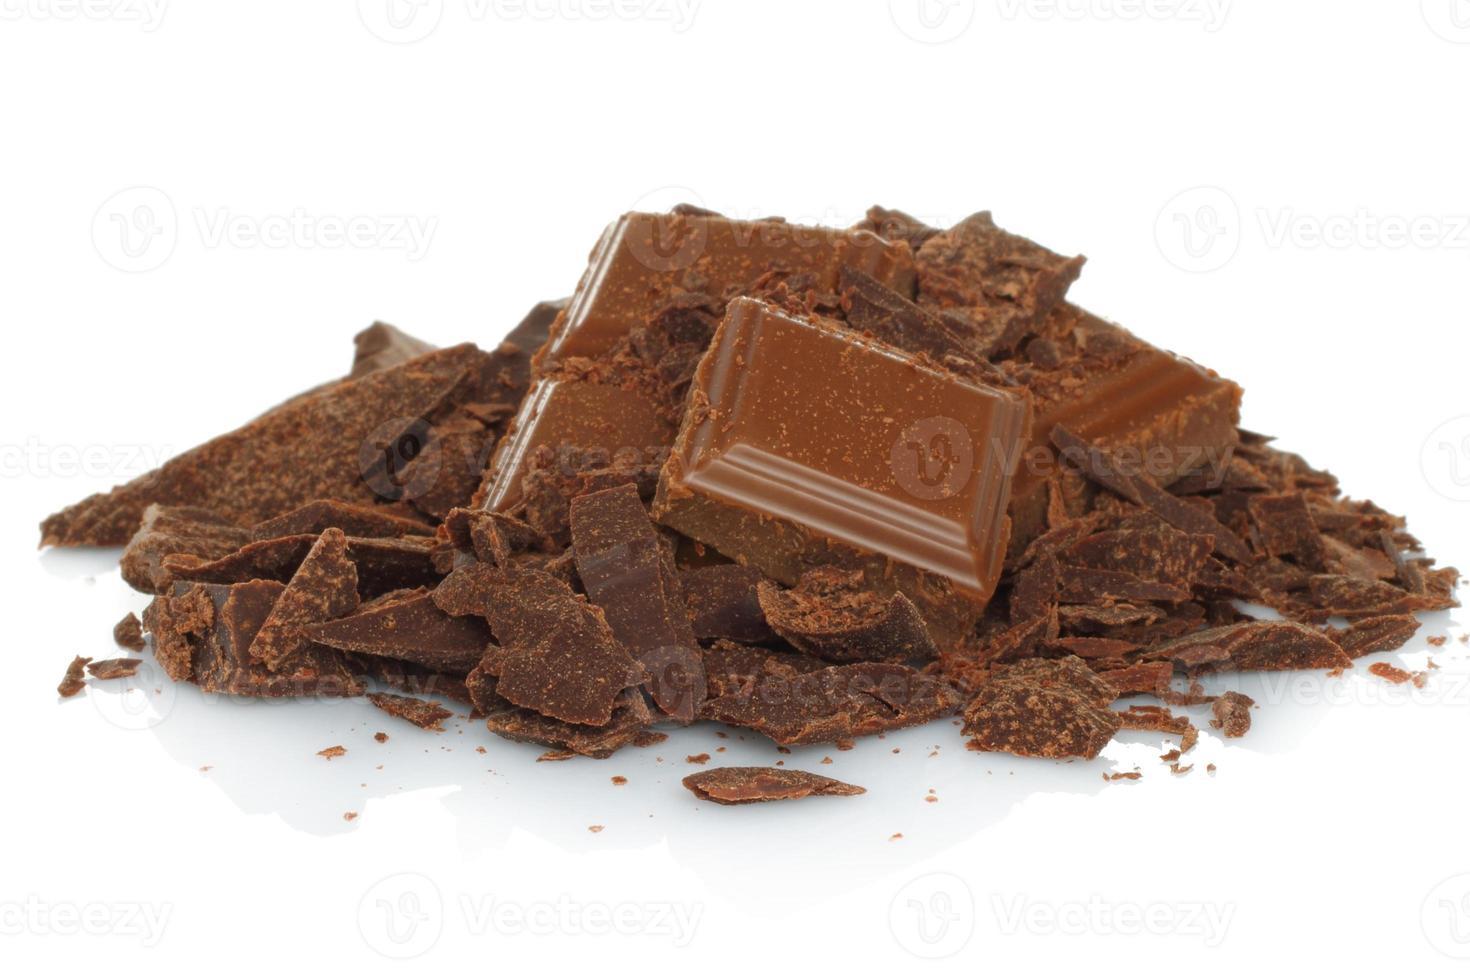 Broken milk chocolate bar photo